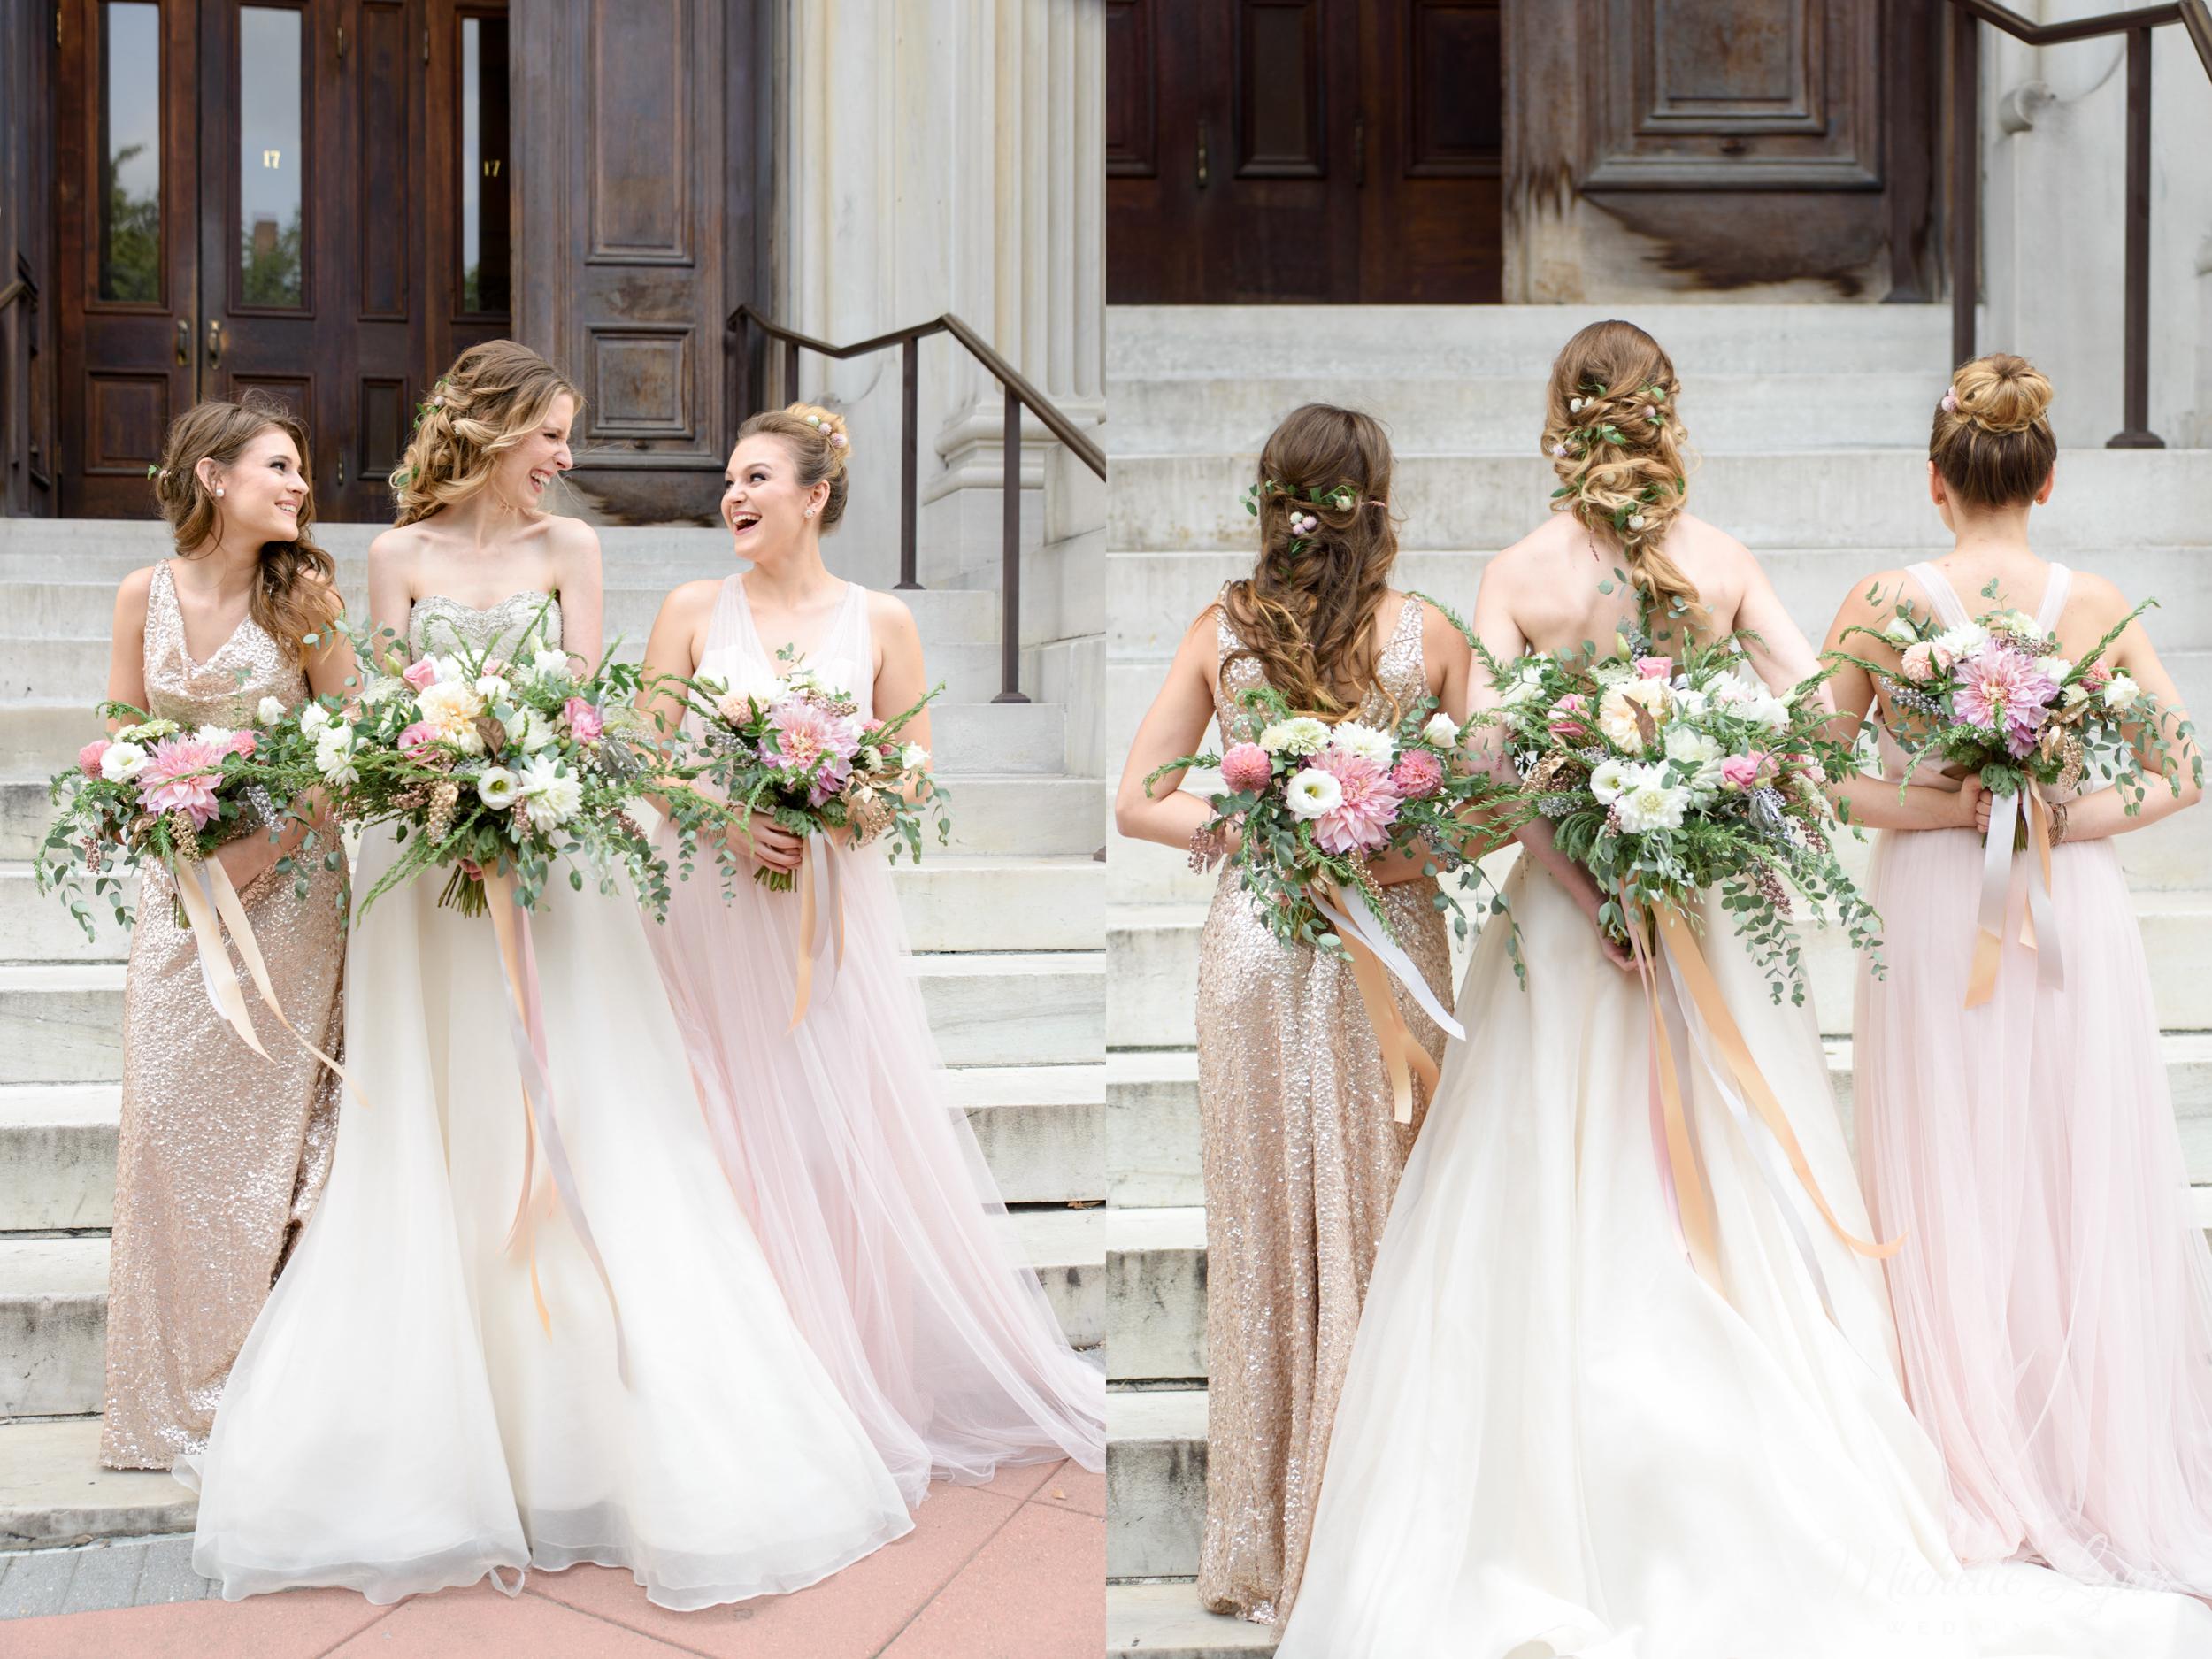 George_Peabody_Library-Wedding_Styled_Shoot-15.jpg